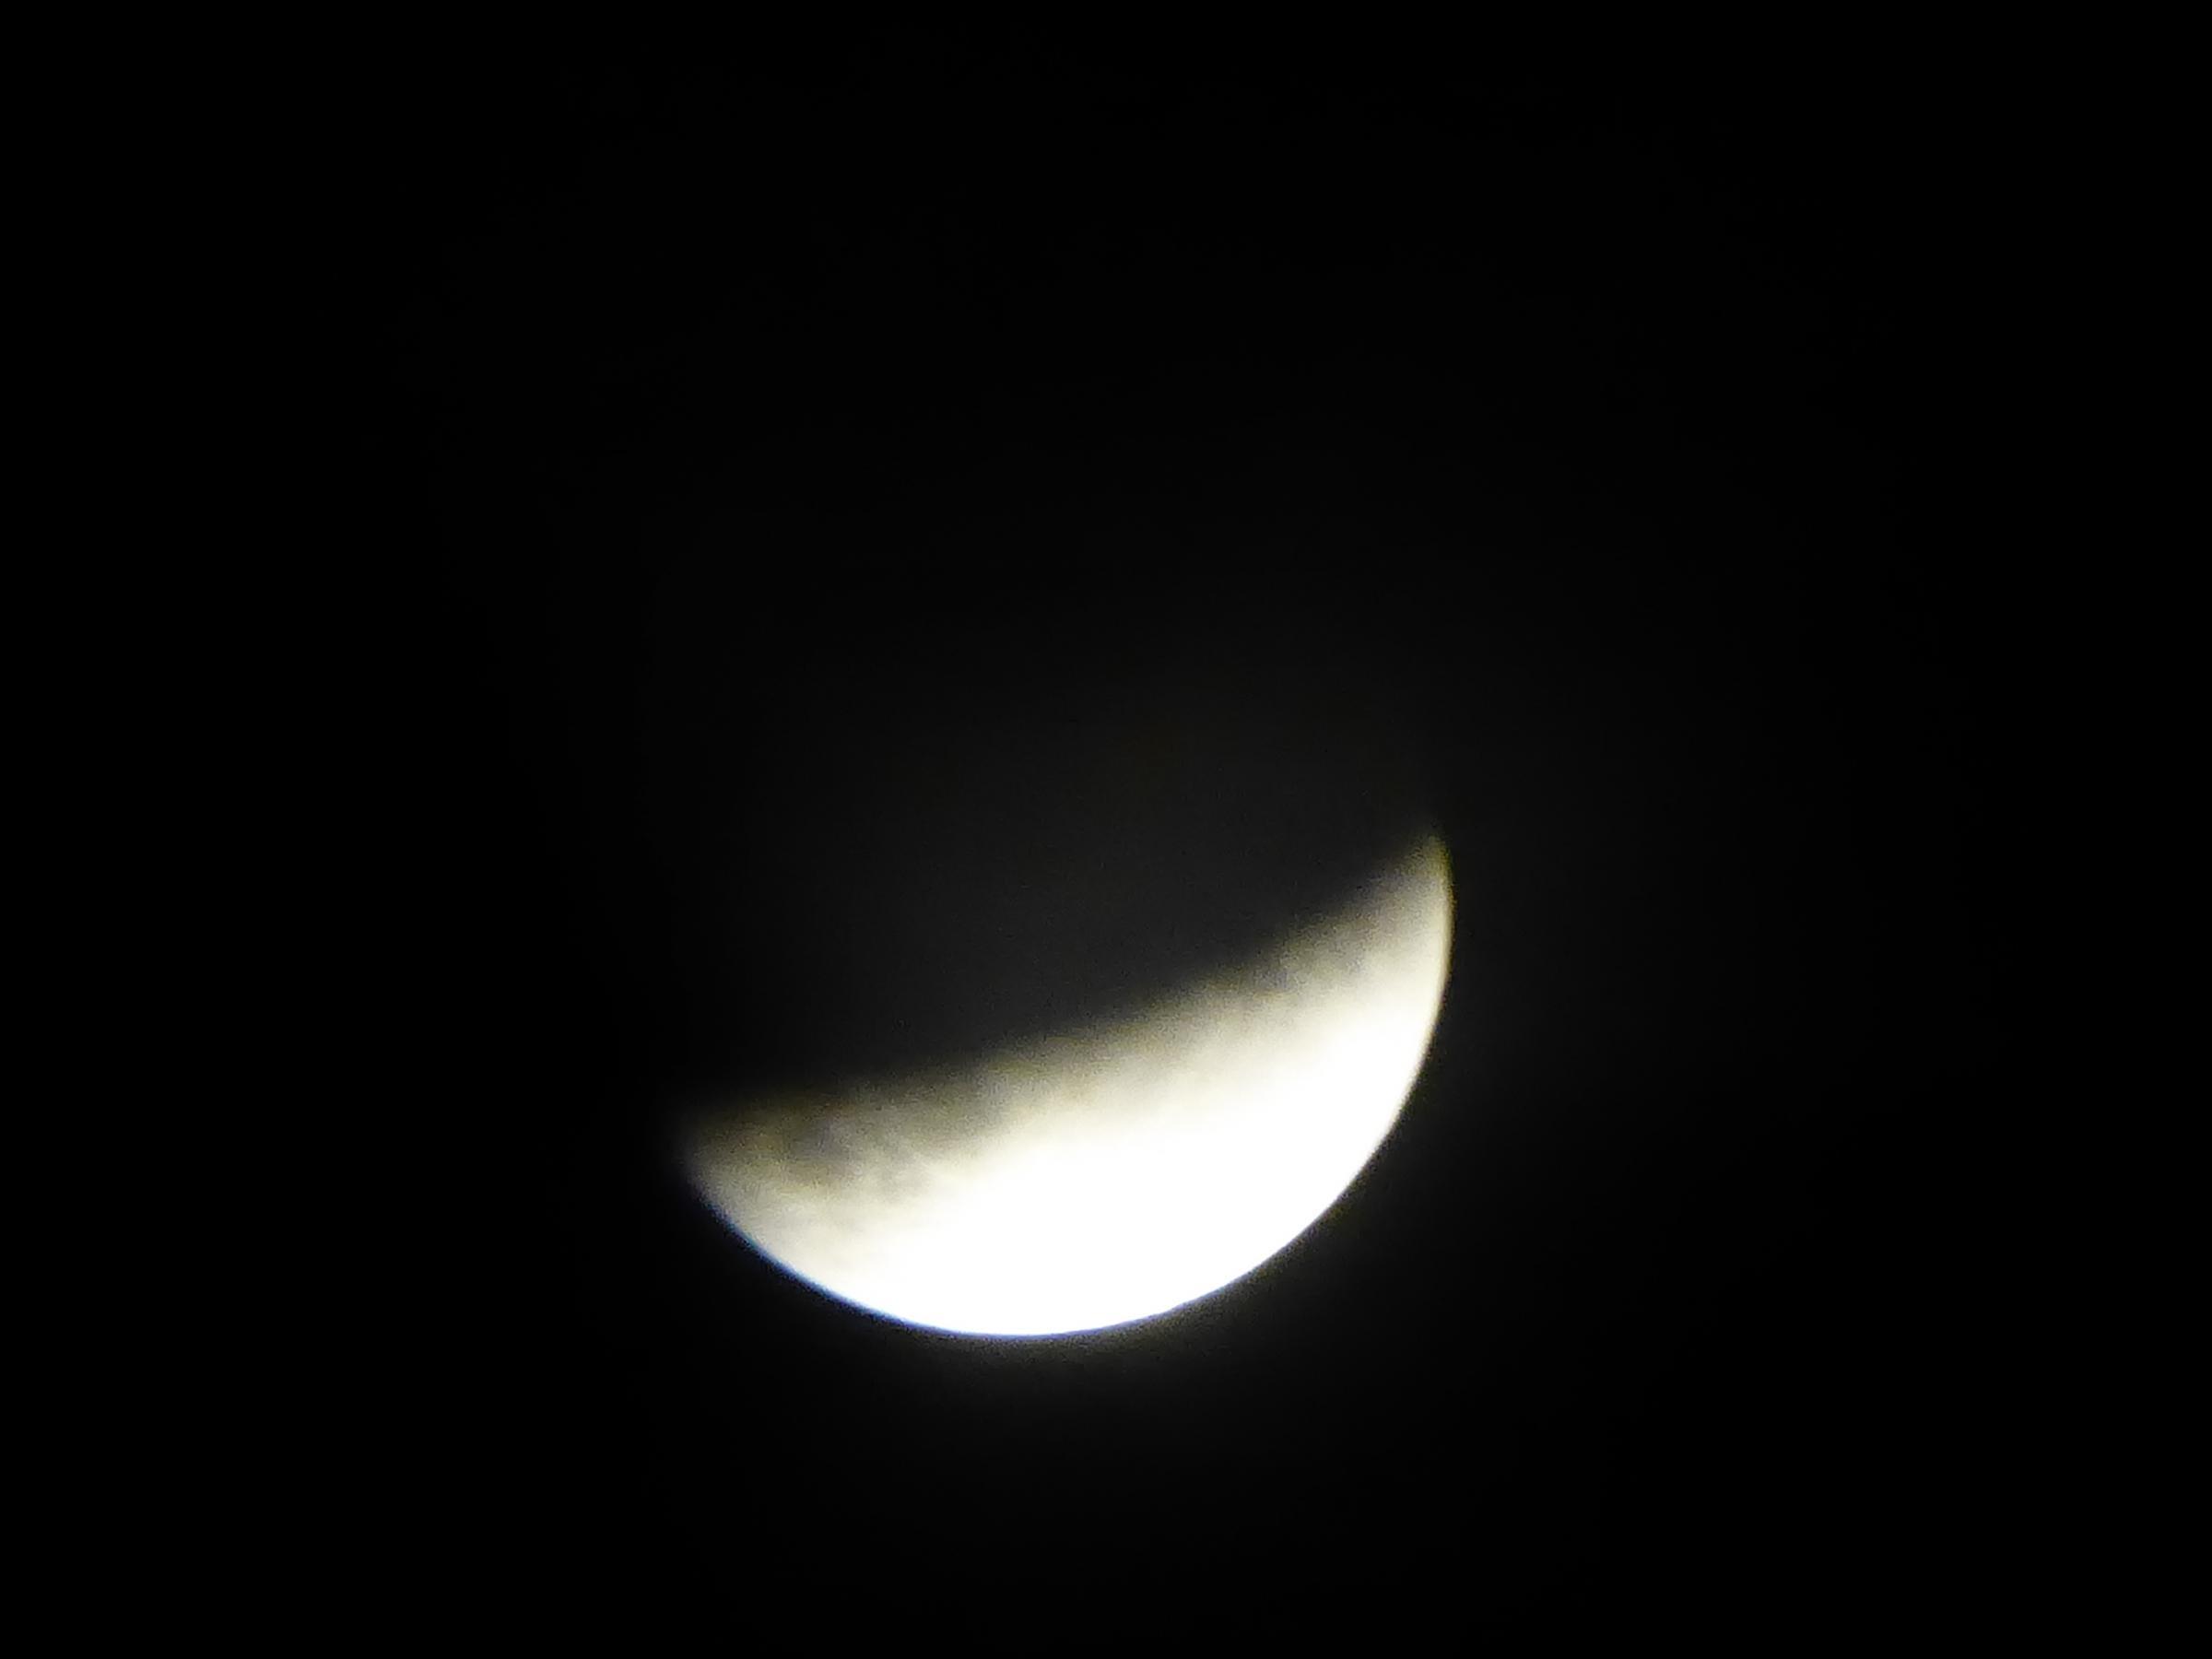 Pictures: Partial lunar eclipse over Dorset